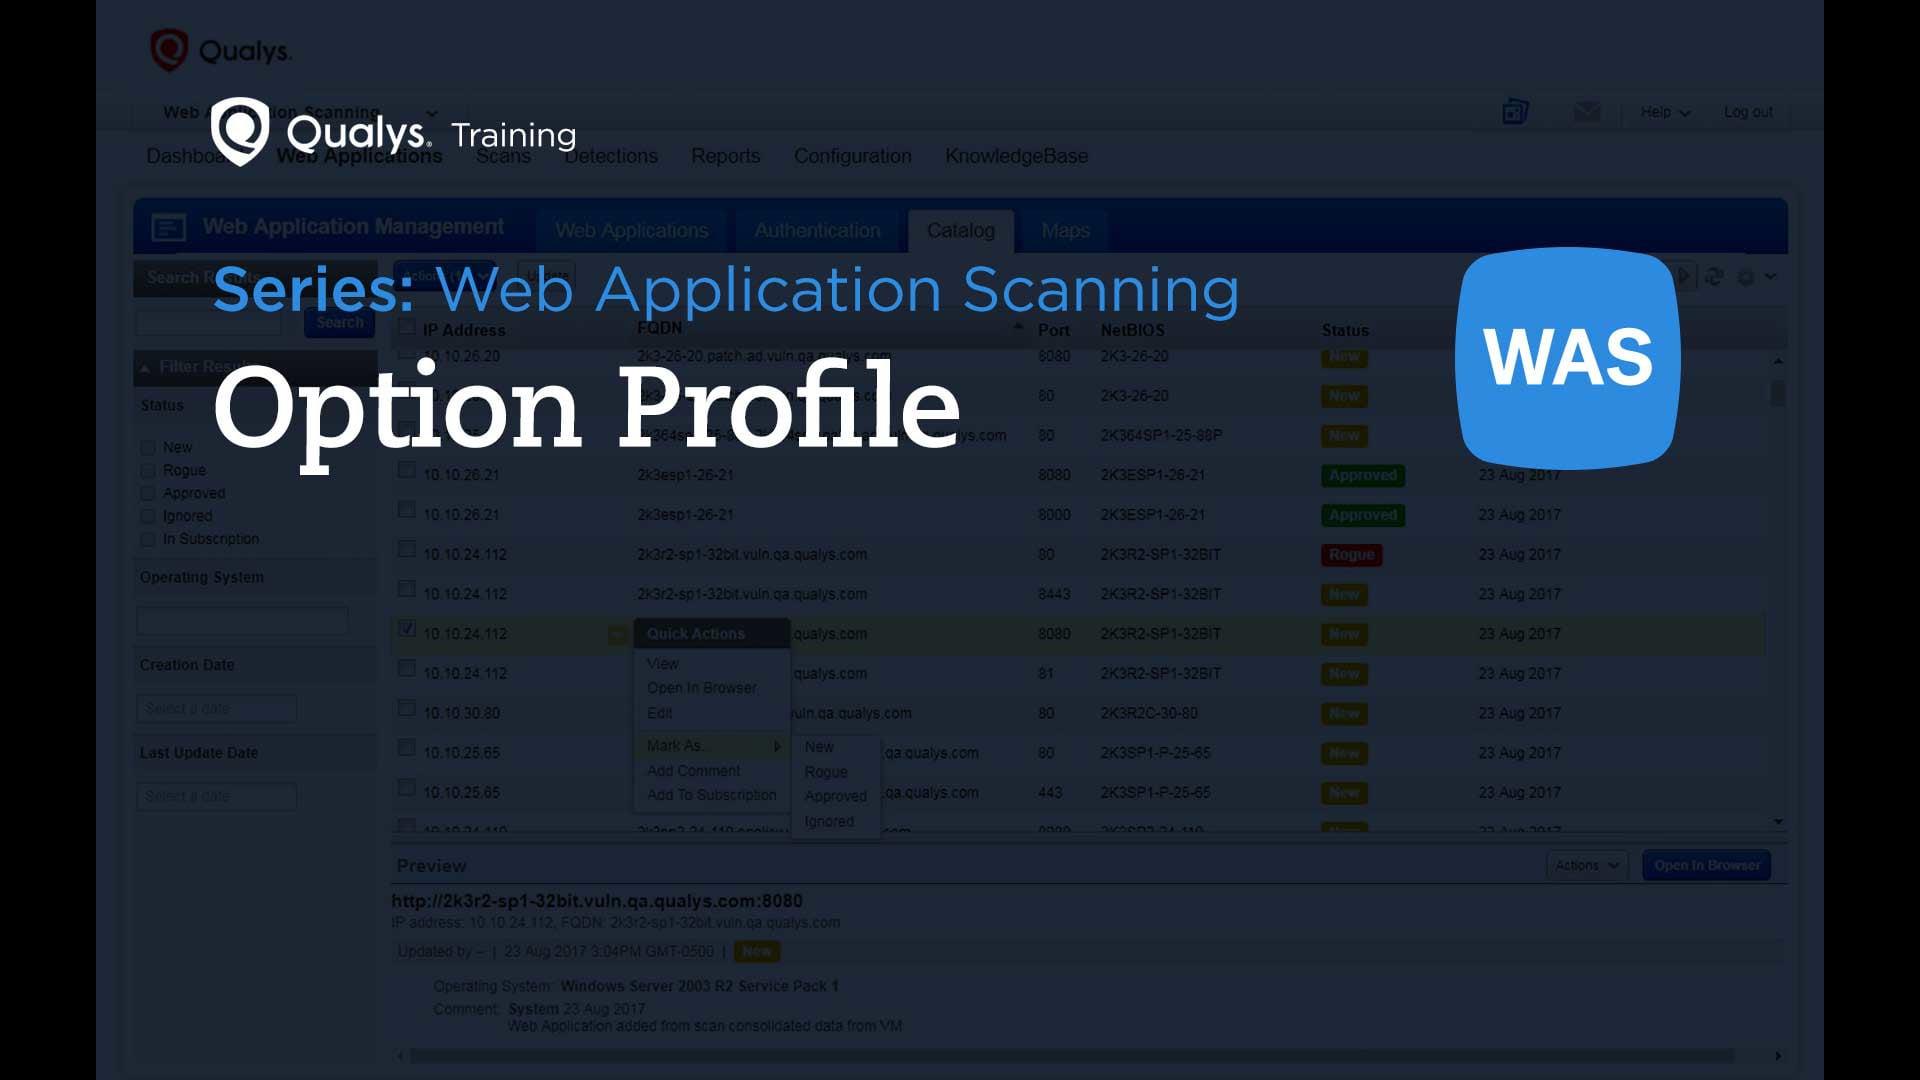 Option Profile